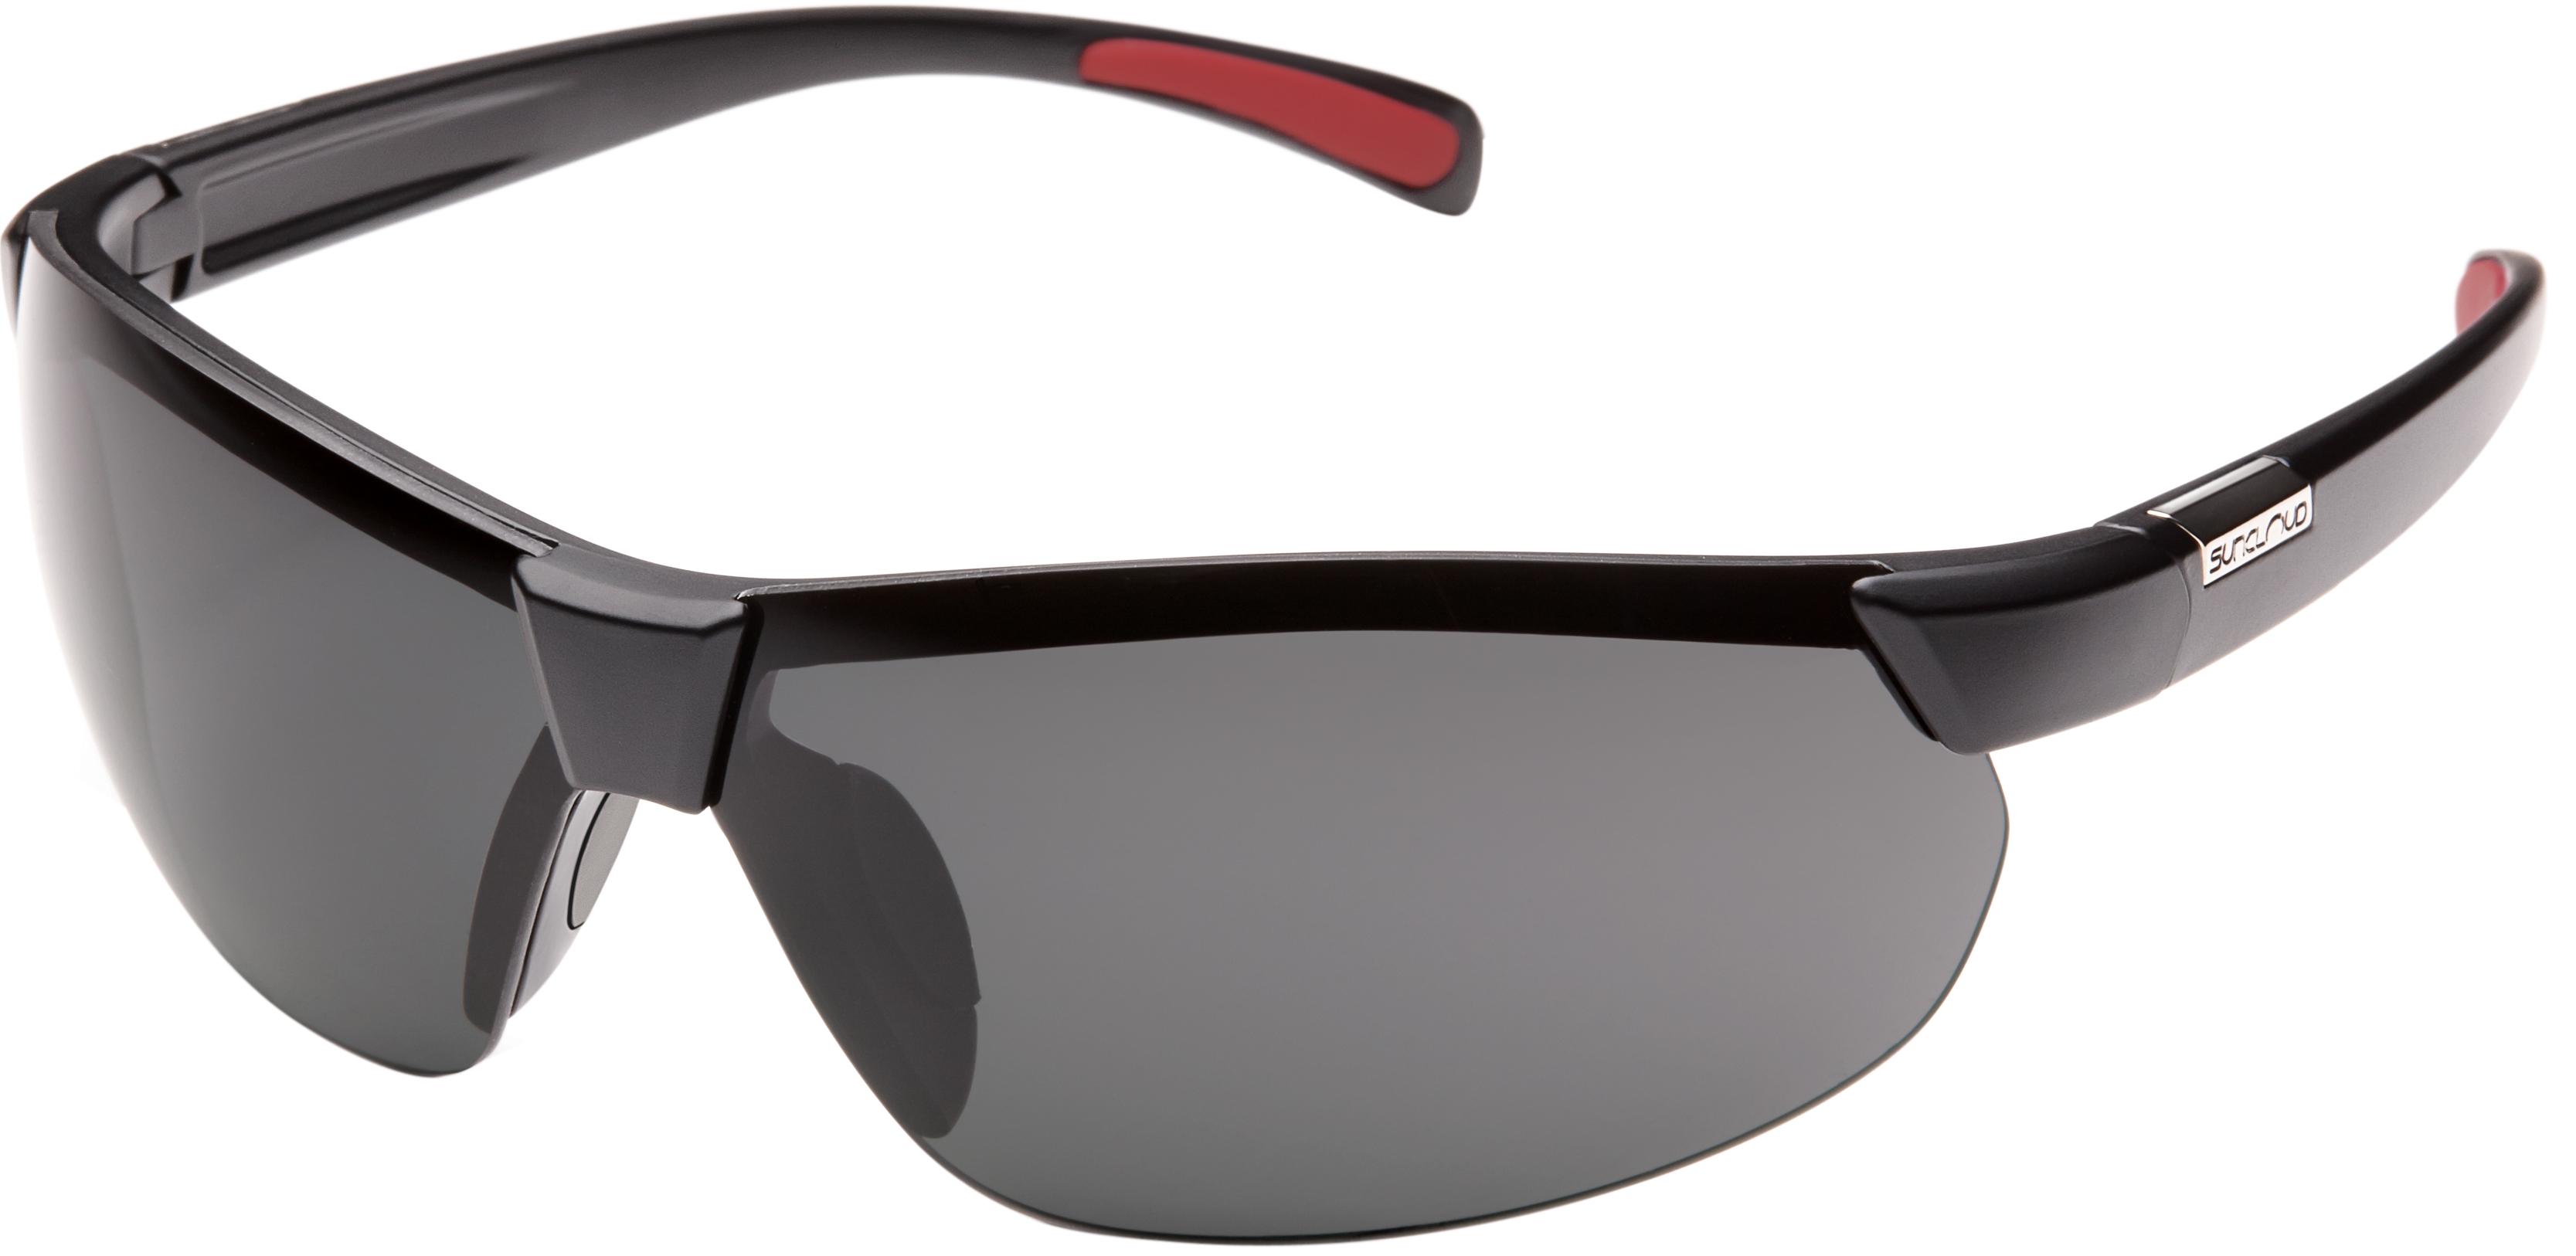 a0c73e28498 Suncloud Switchback Polarized Sunglasses - Unisex